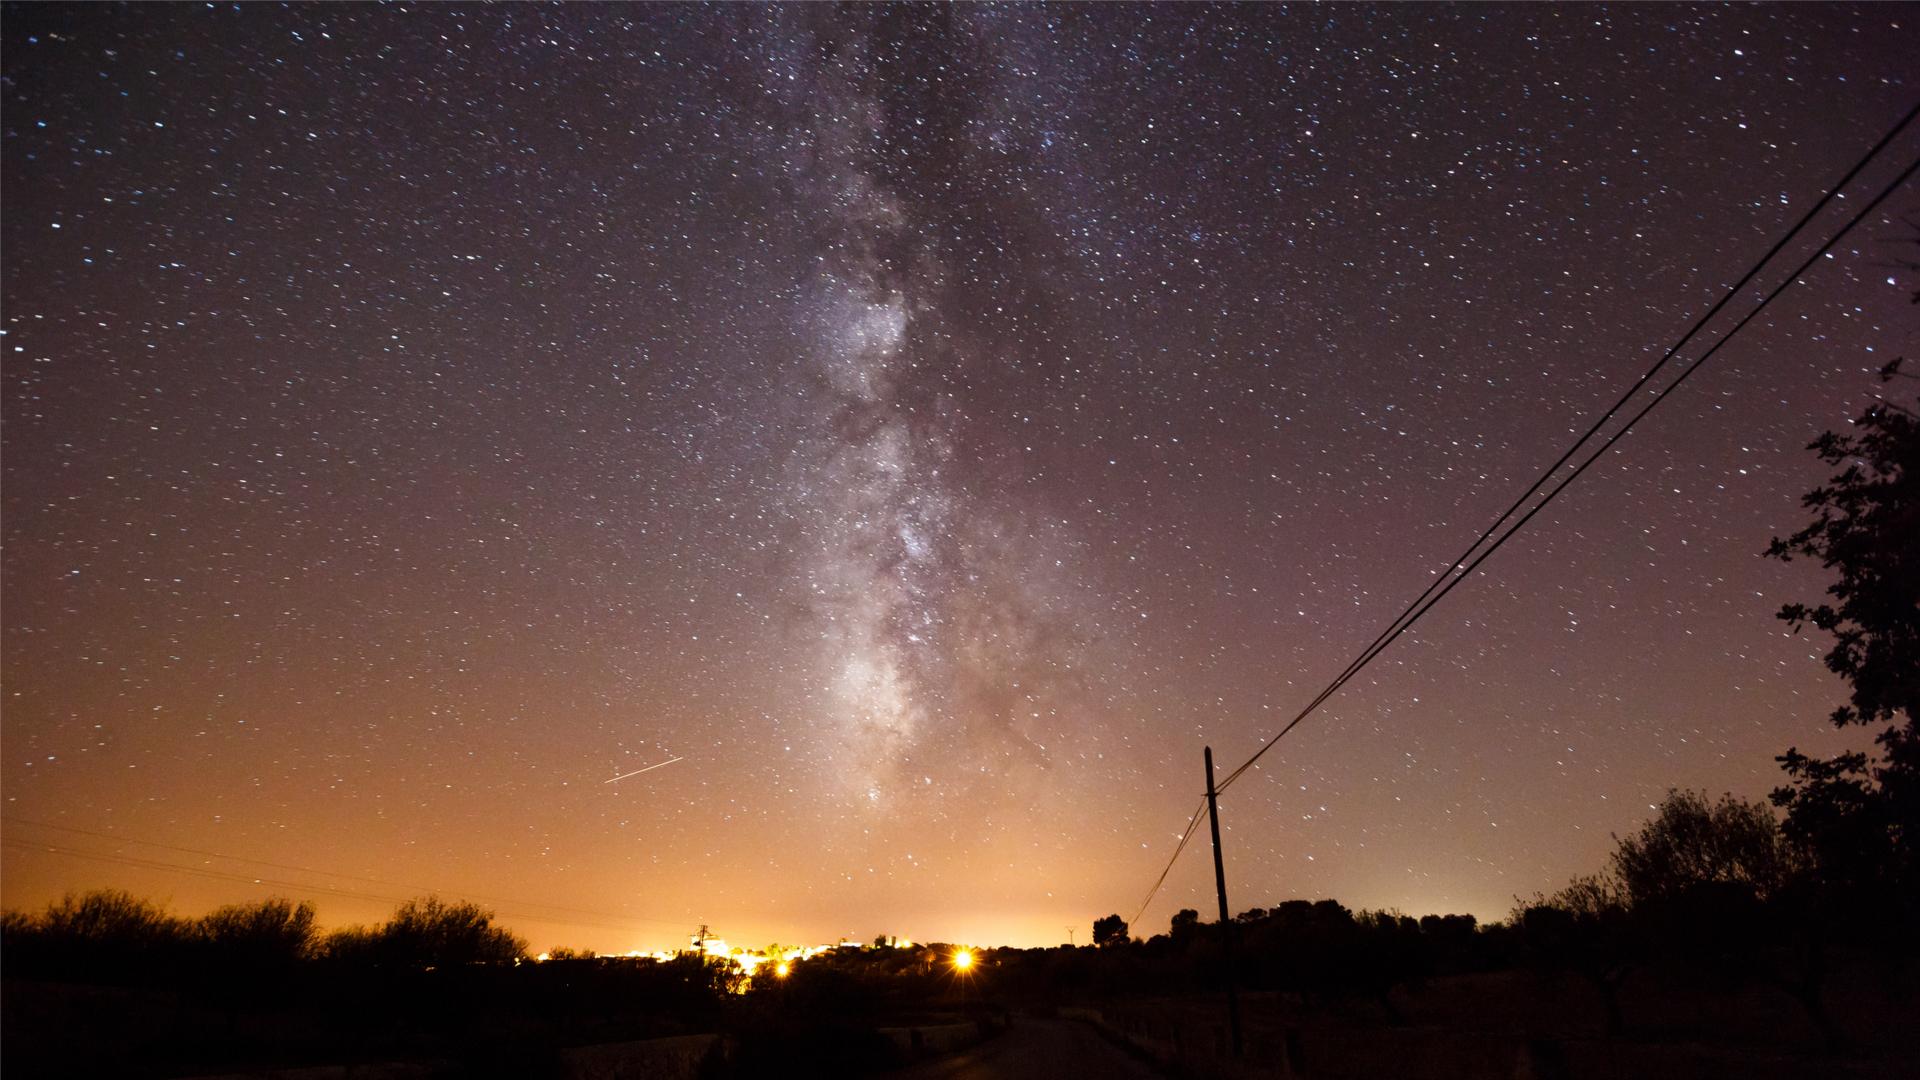 Stargazing mallorca wonderful night heavens over road mallorca